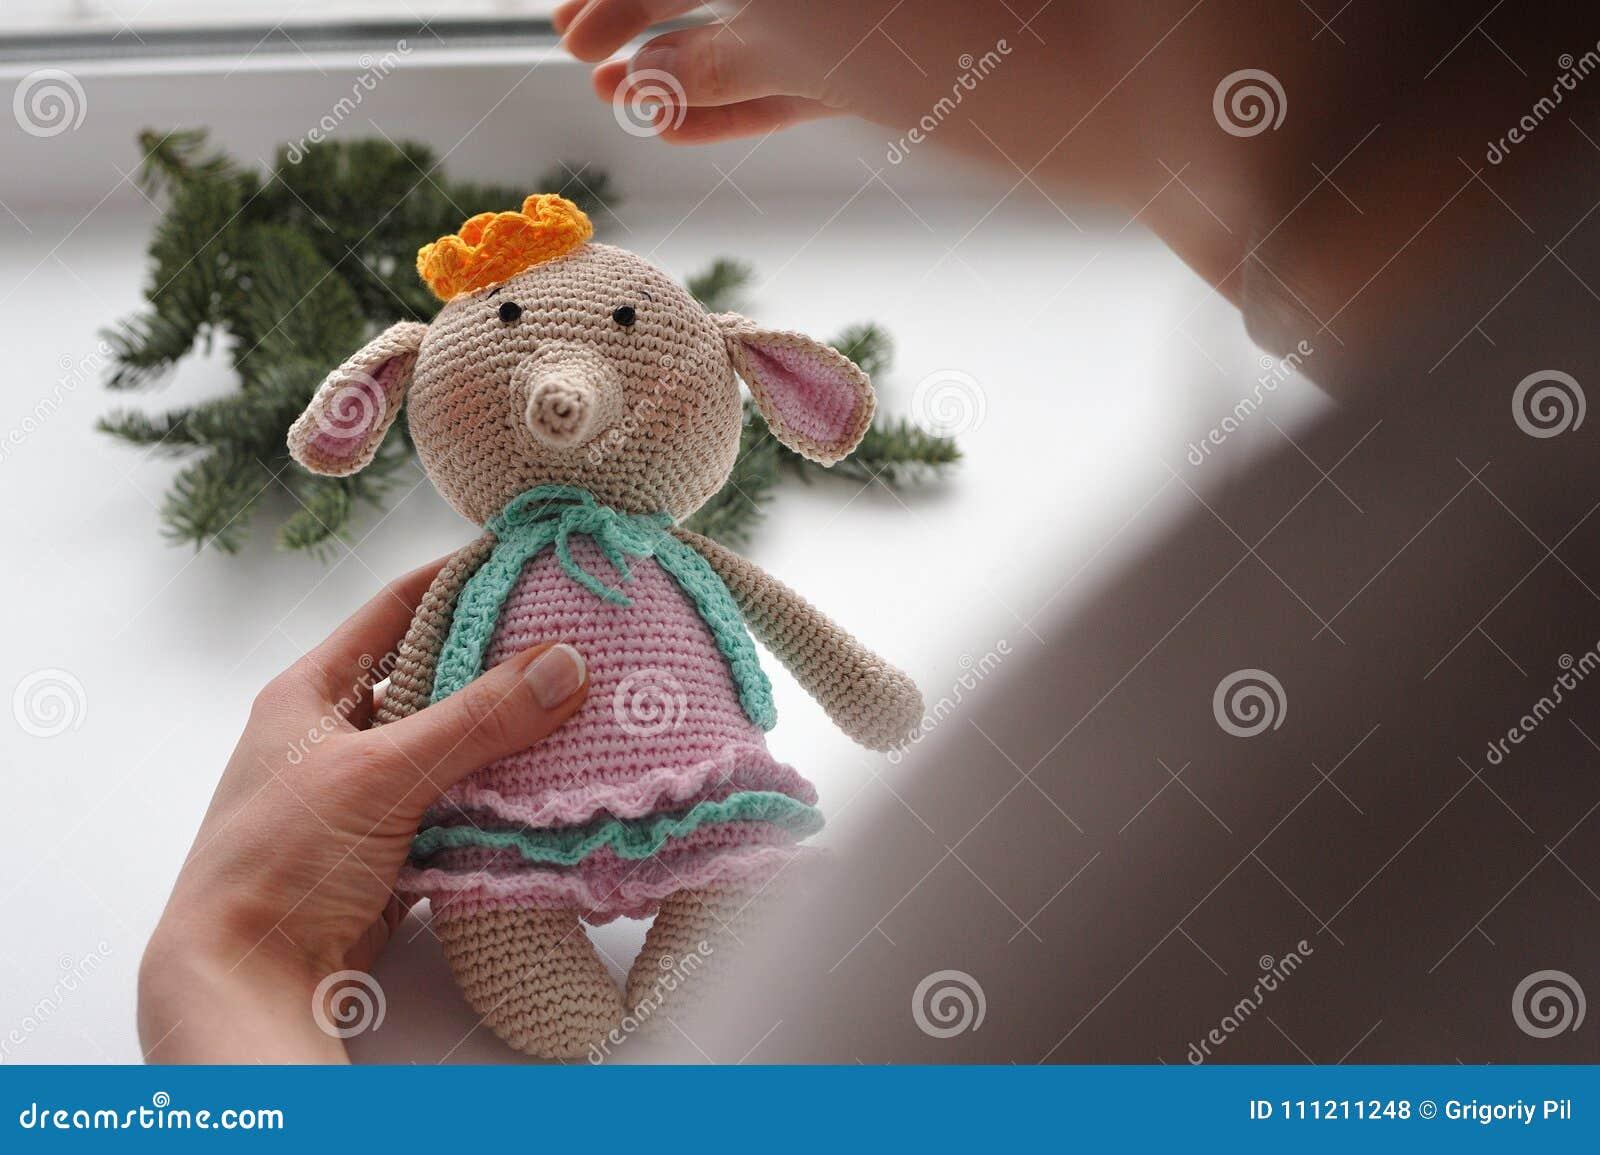 Amigurumi Elephant Free Pattern   Crochet elephant pattern free ...   955x1300